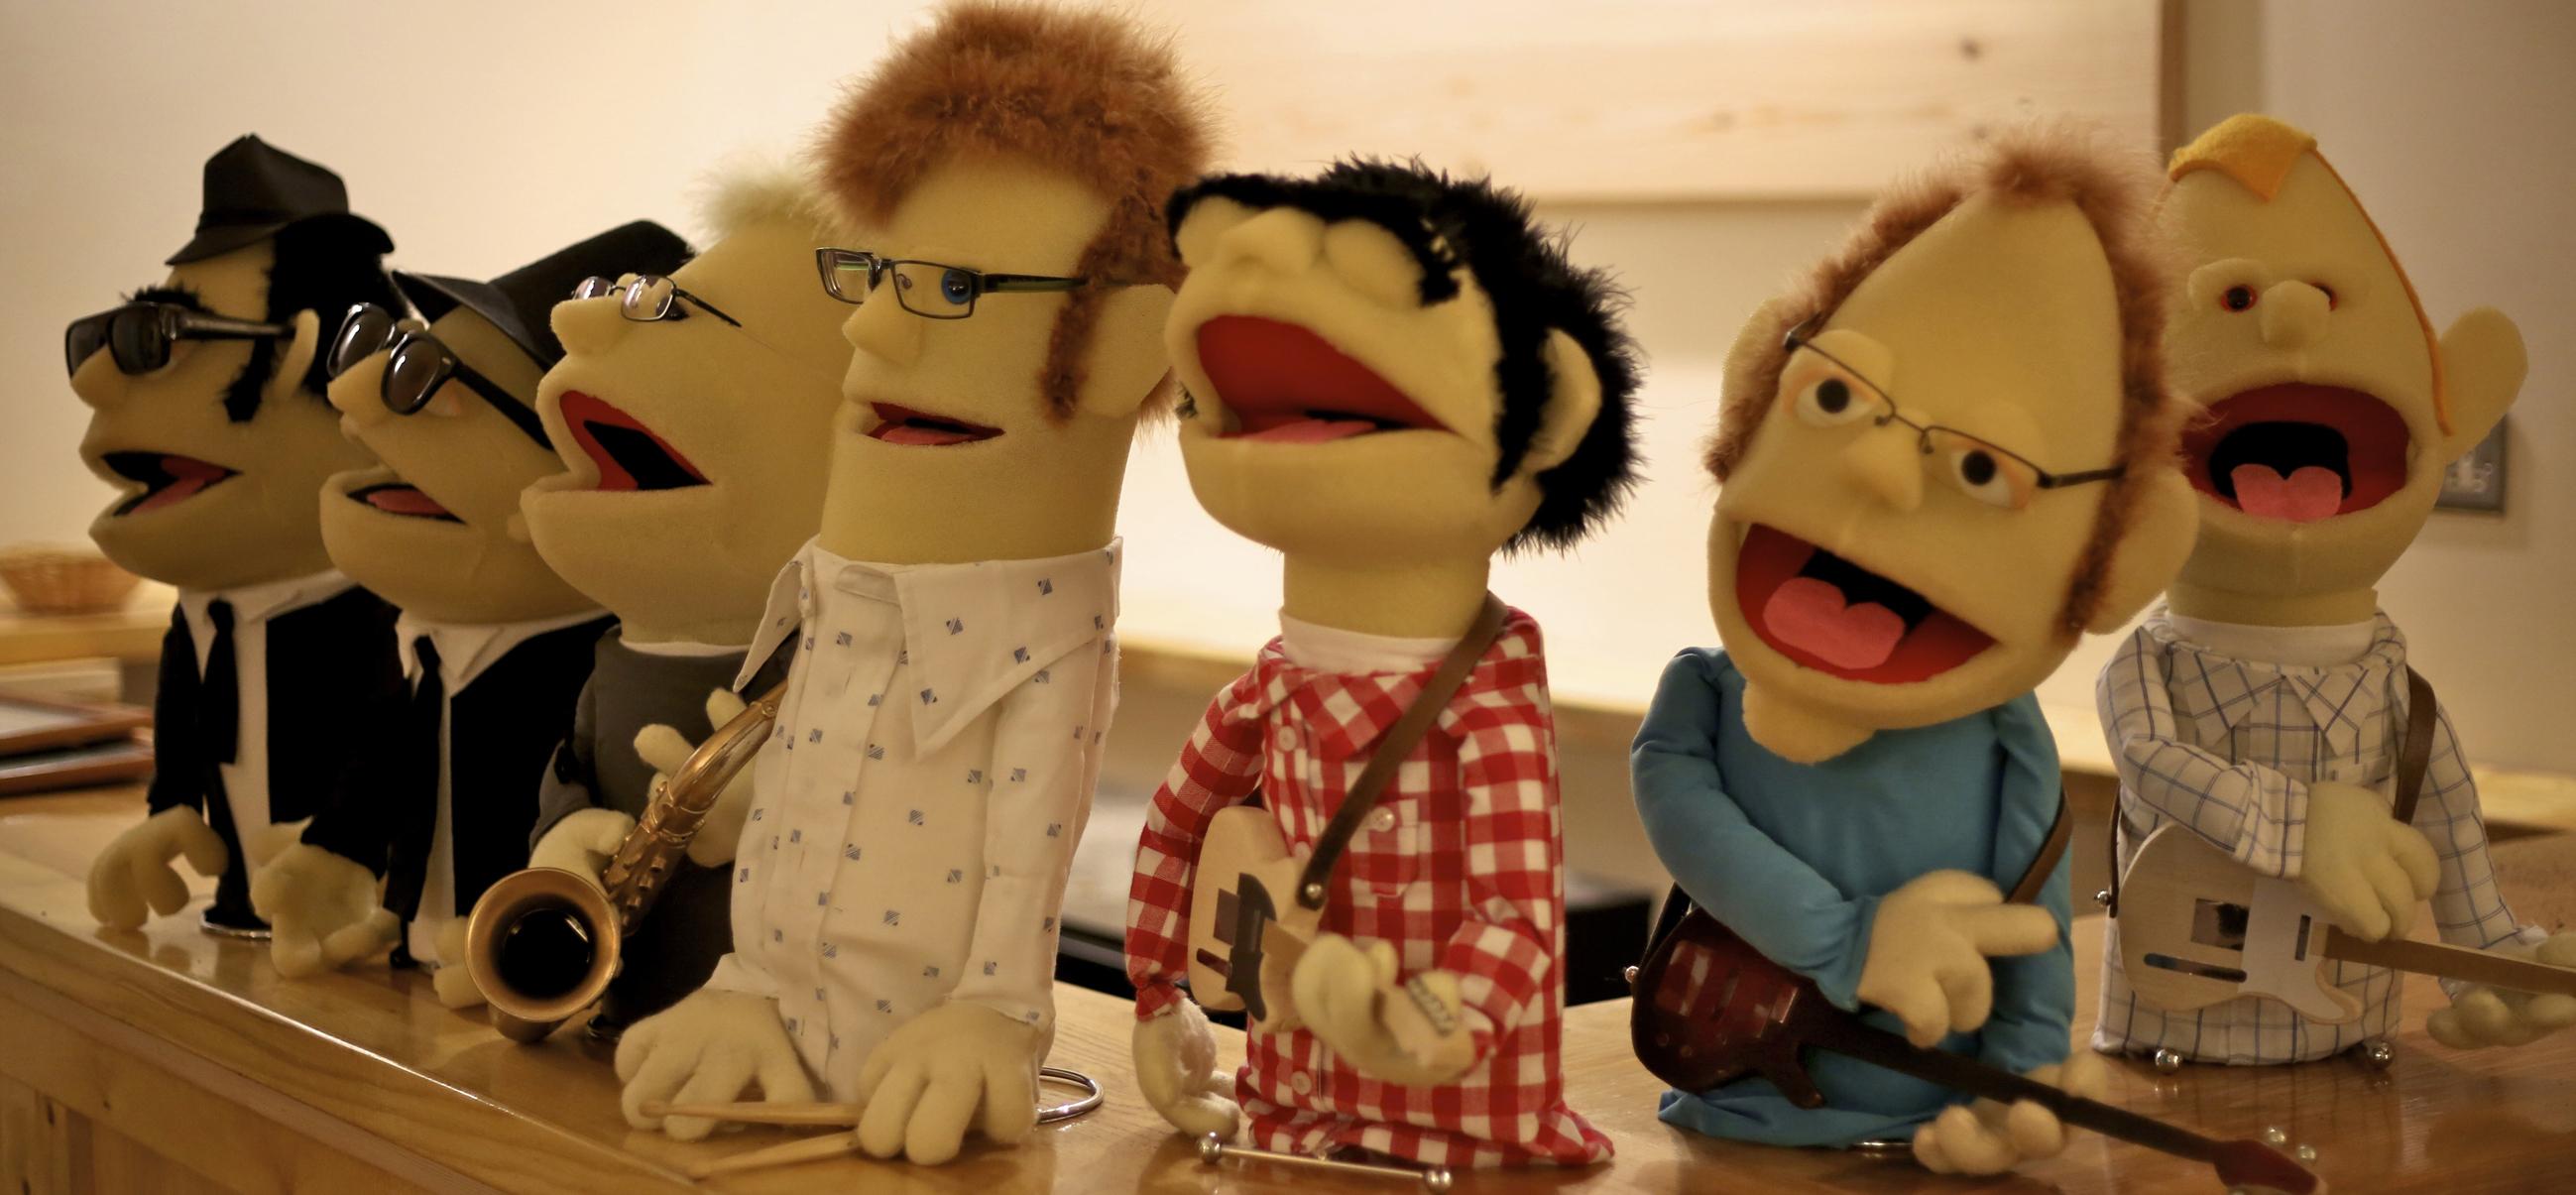 North Walsham Booze Brothers Puppets